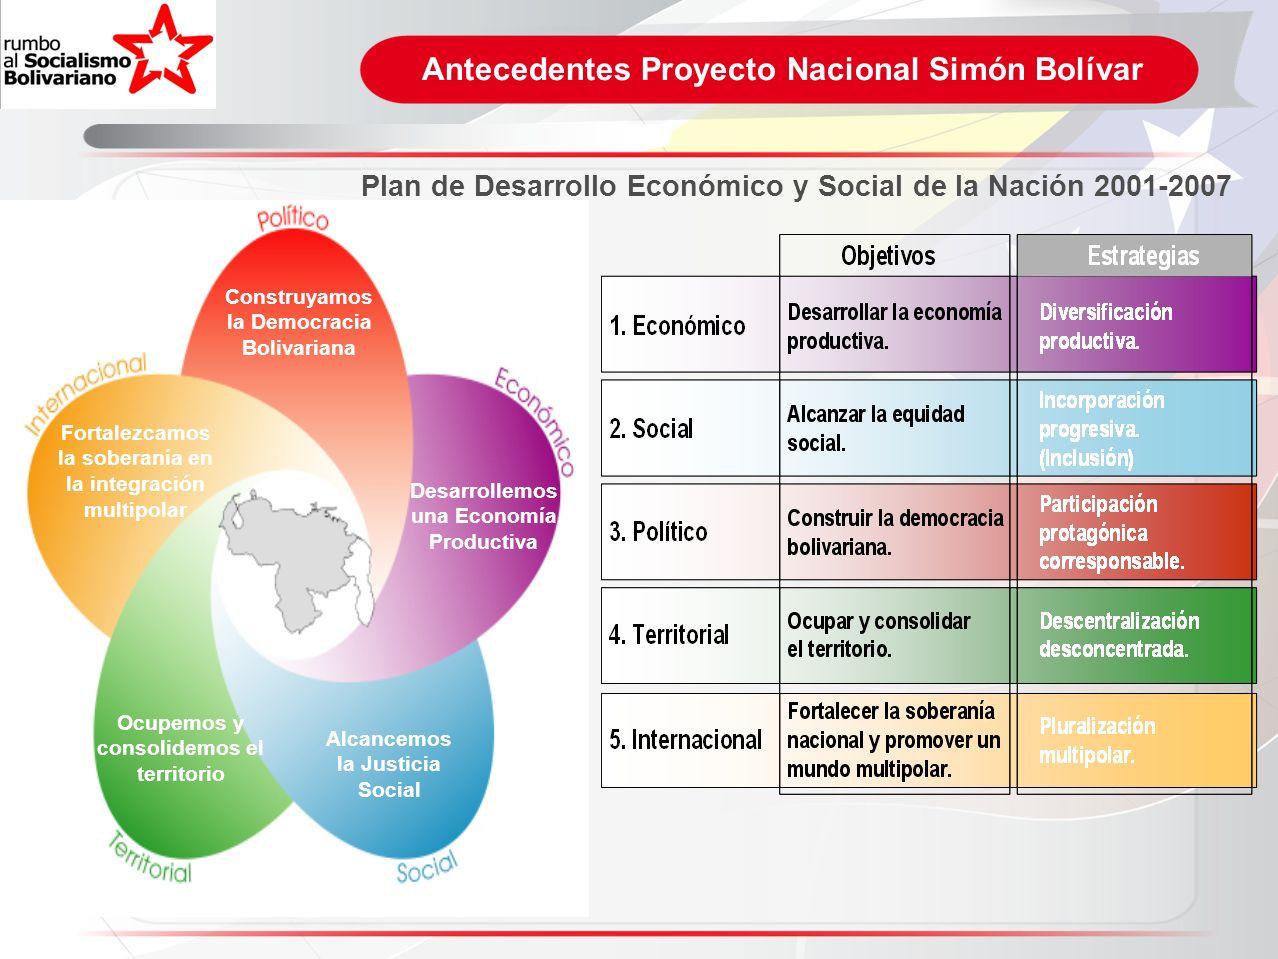 Proyecto Nacional Simón Bolívar Nueva Geopolítica Nacional.